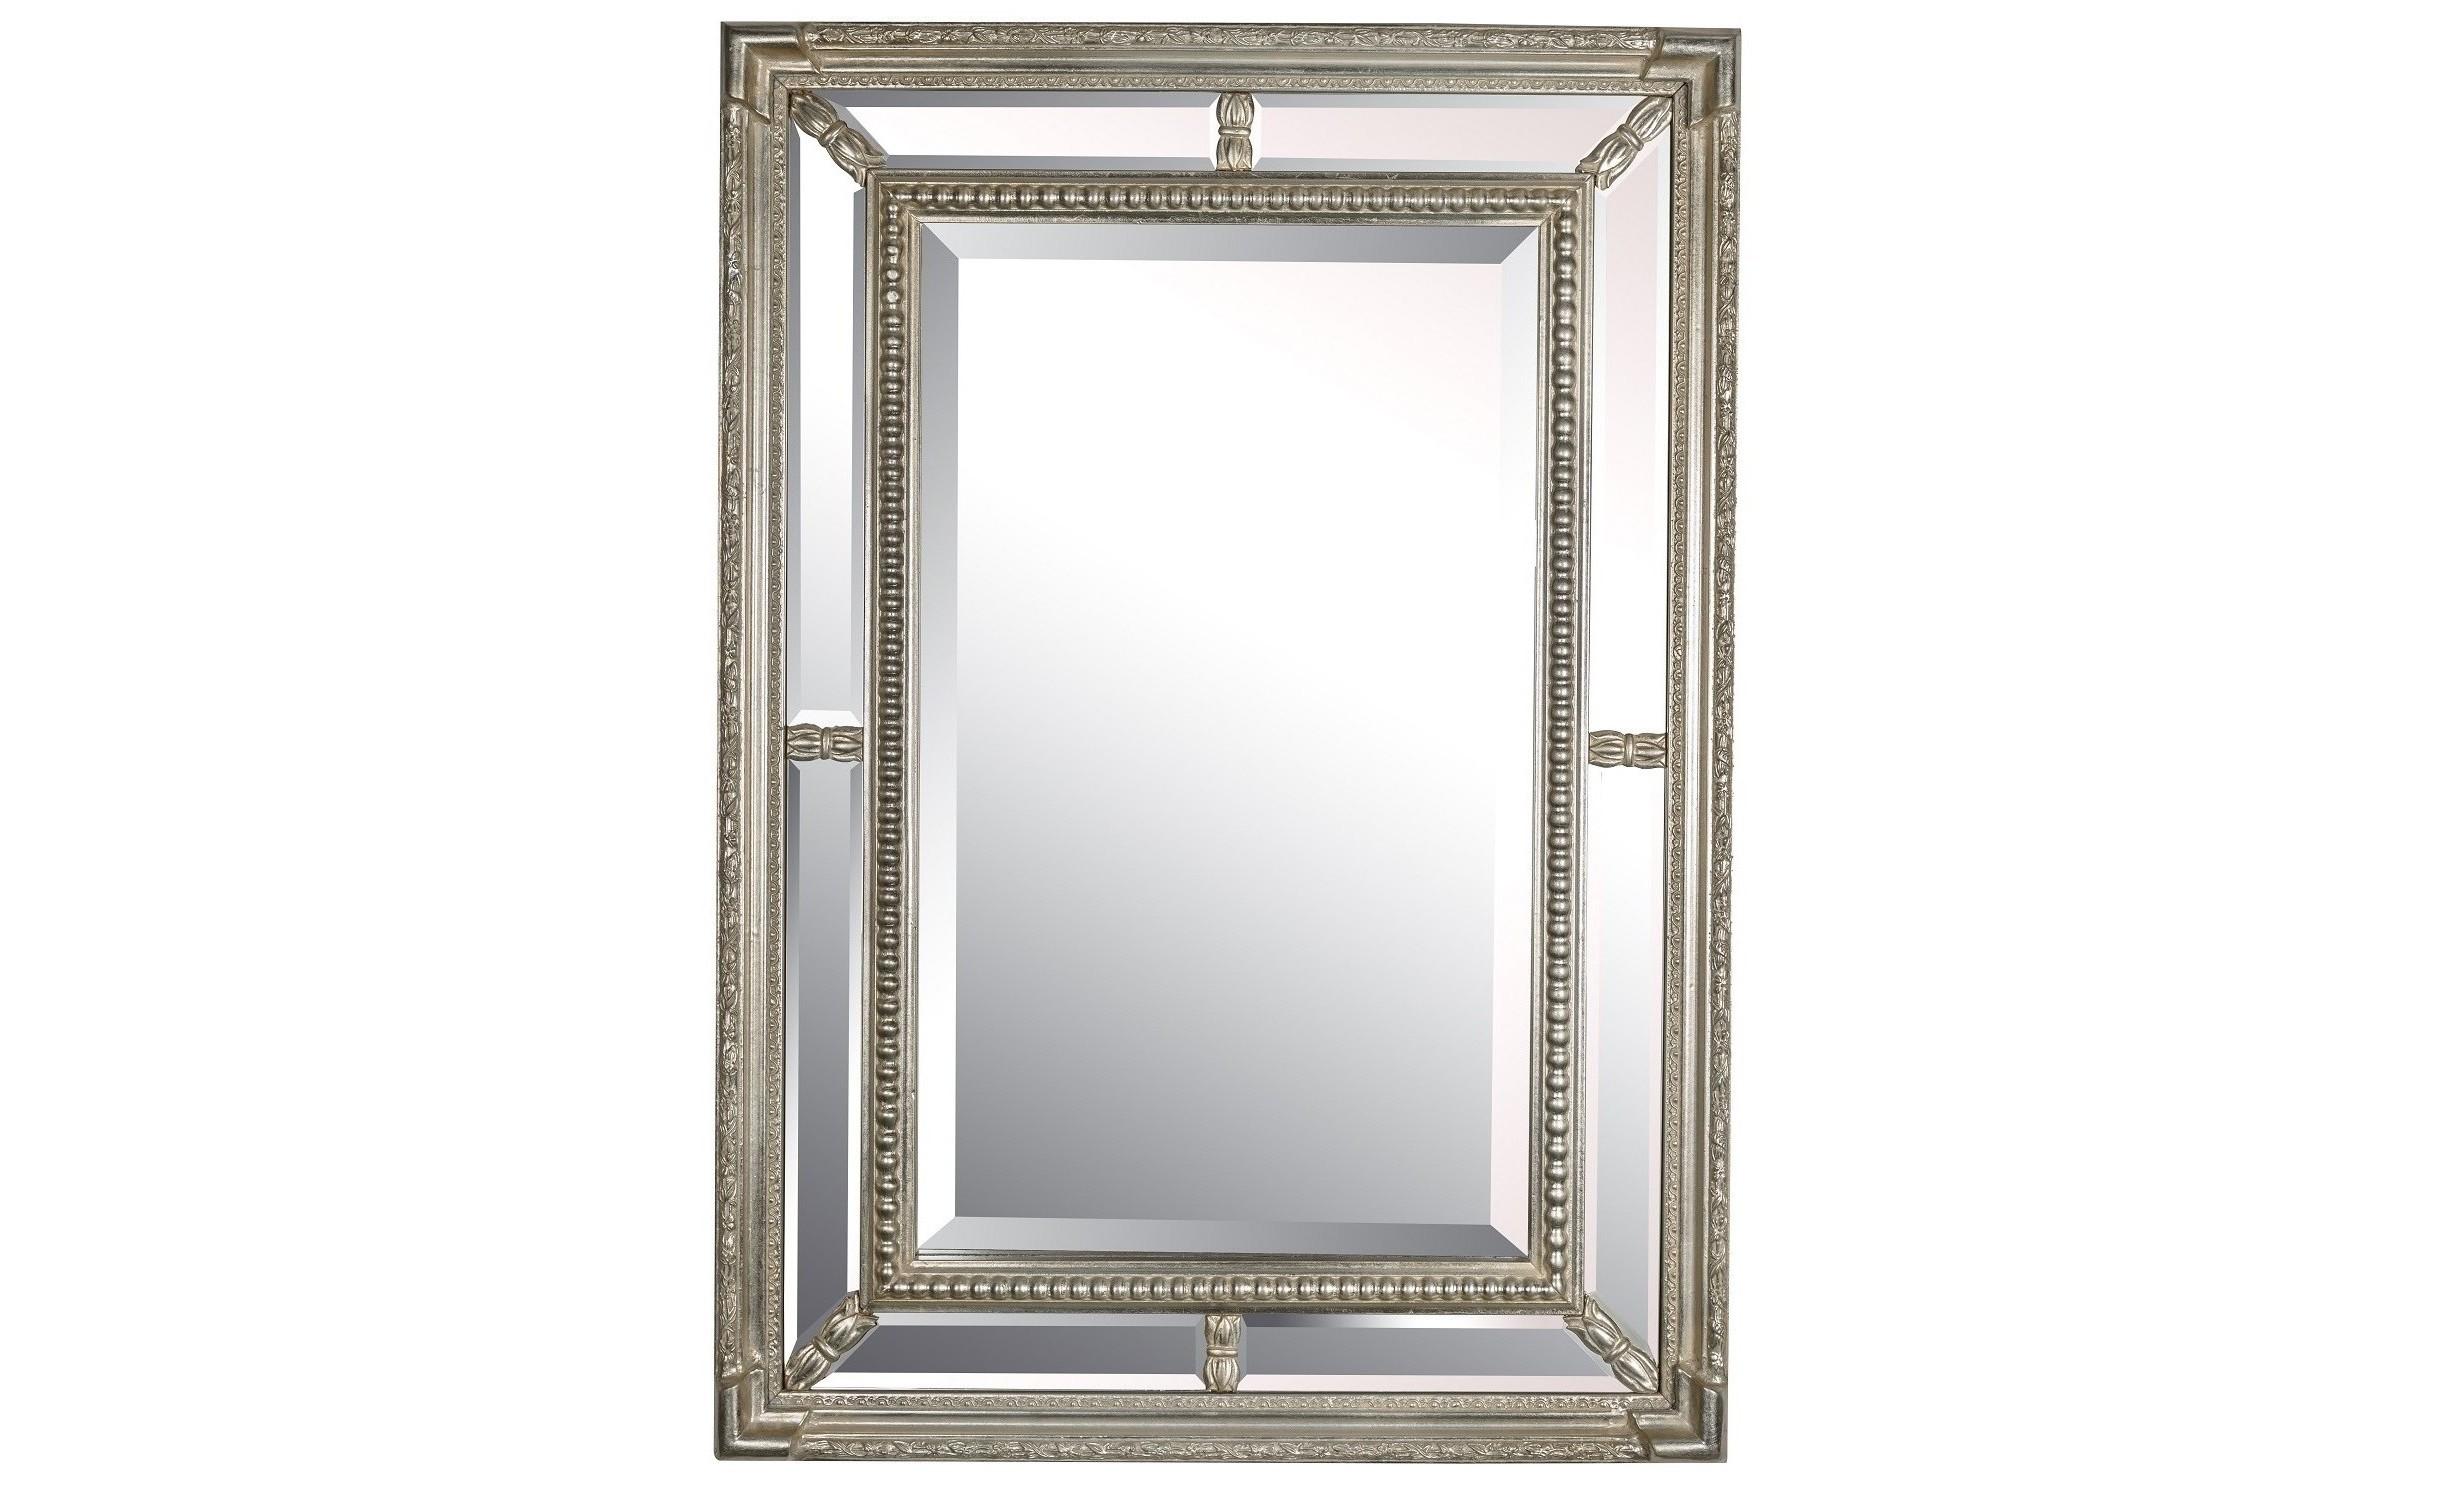 Зеркало Albert SilverНастенные зеркала<br><br><br>Material: Полирезин<br>Ширина см: 61.0<br>Высота см: 86.0<br>Глубина см: 4.0